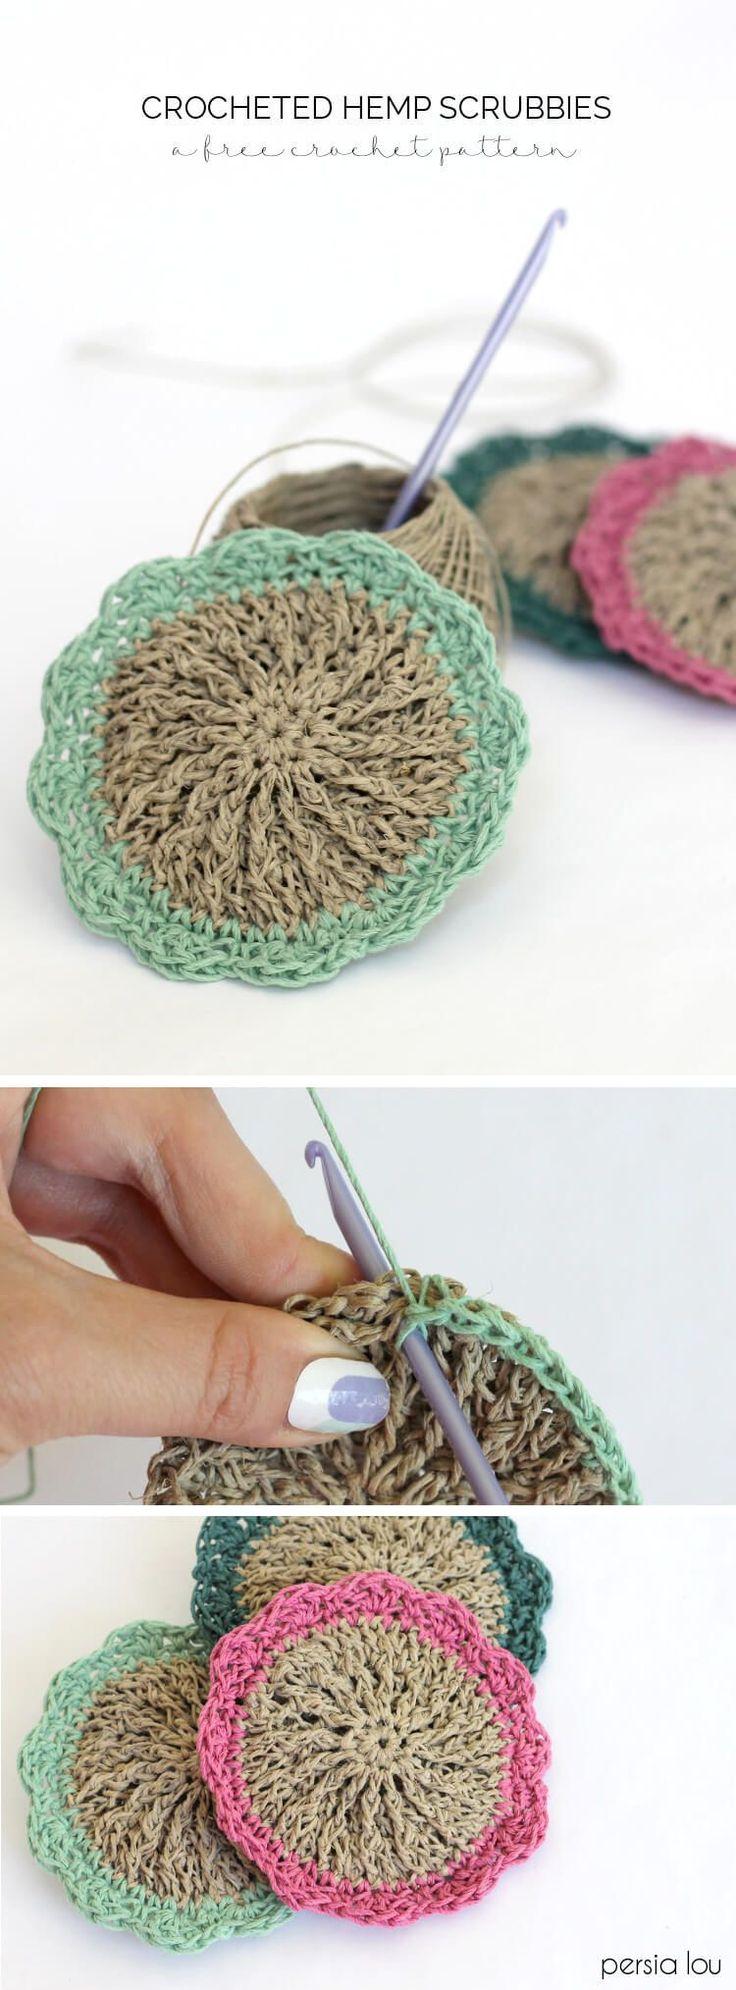 177 best Crochet for the Kitchen images on Pinterest | Crocheting ...